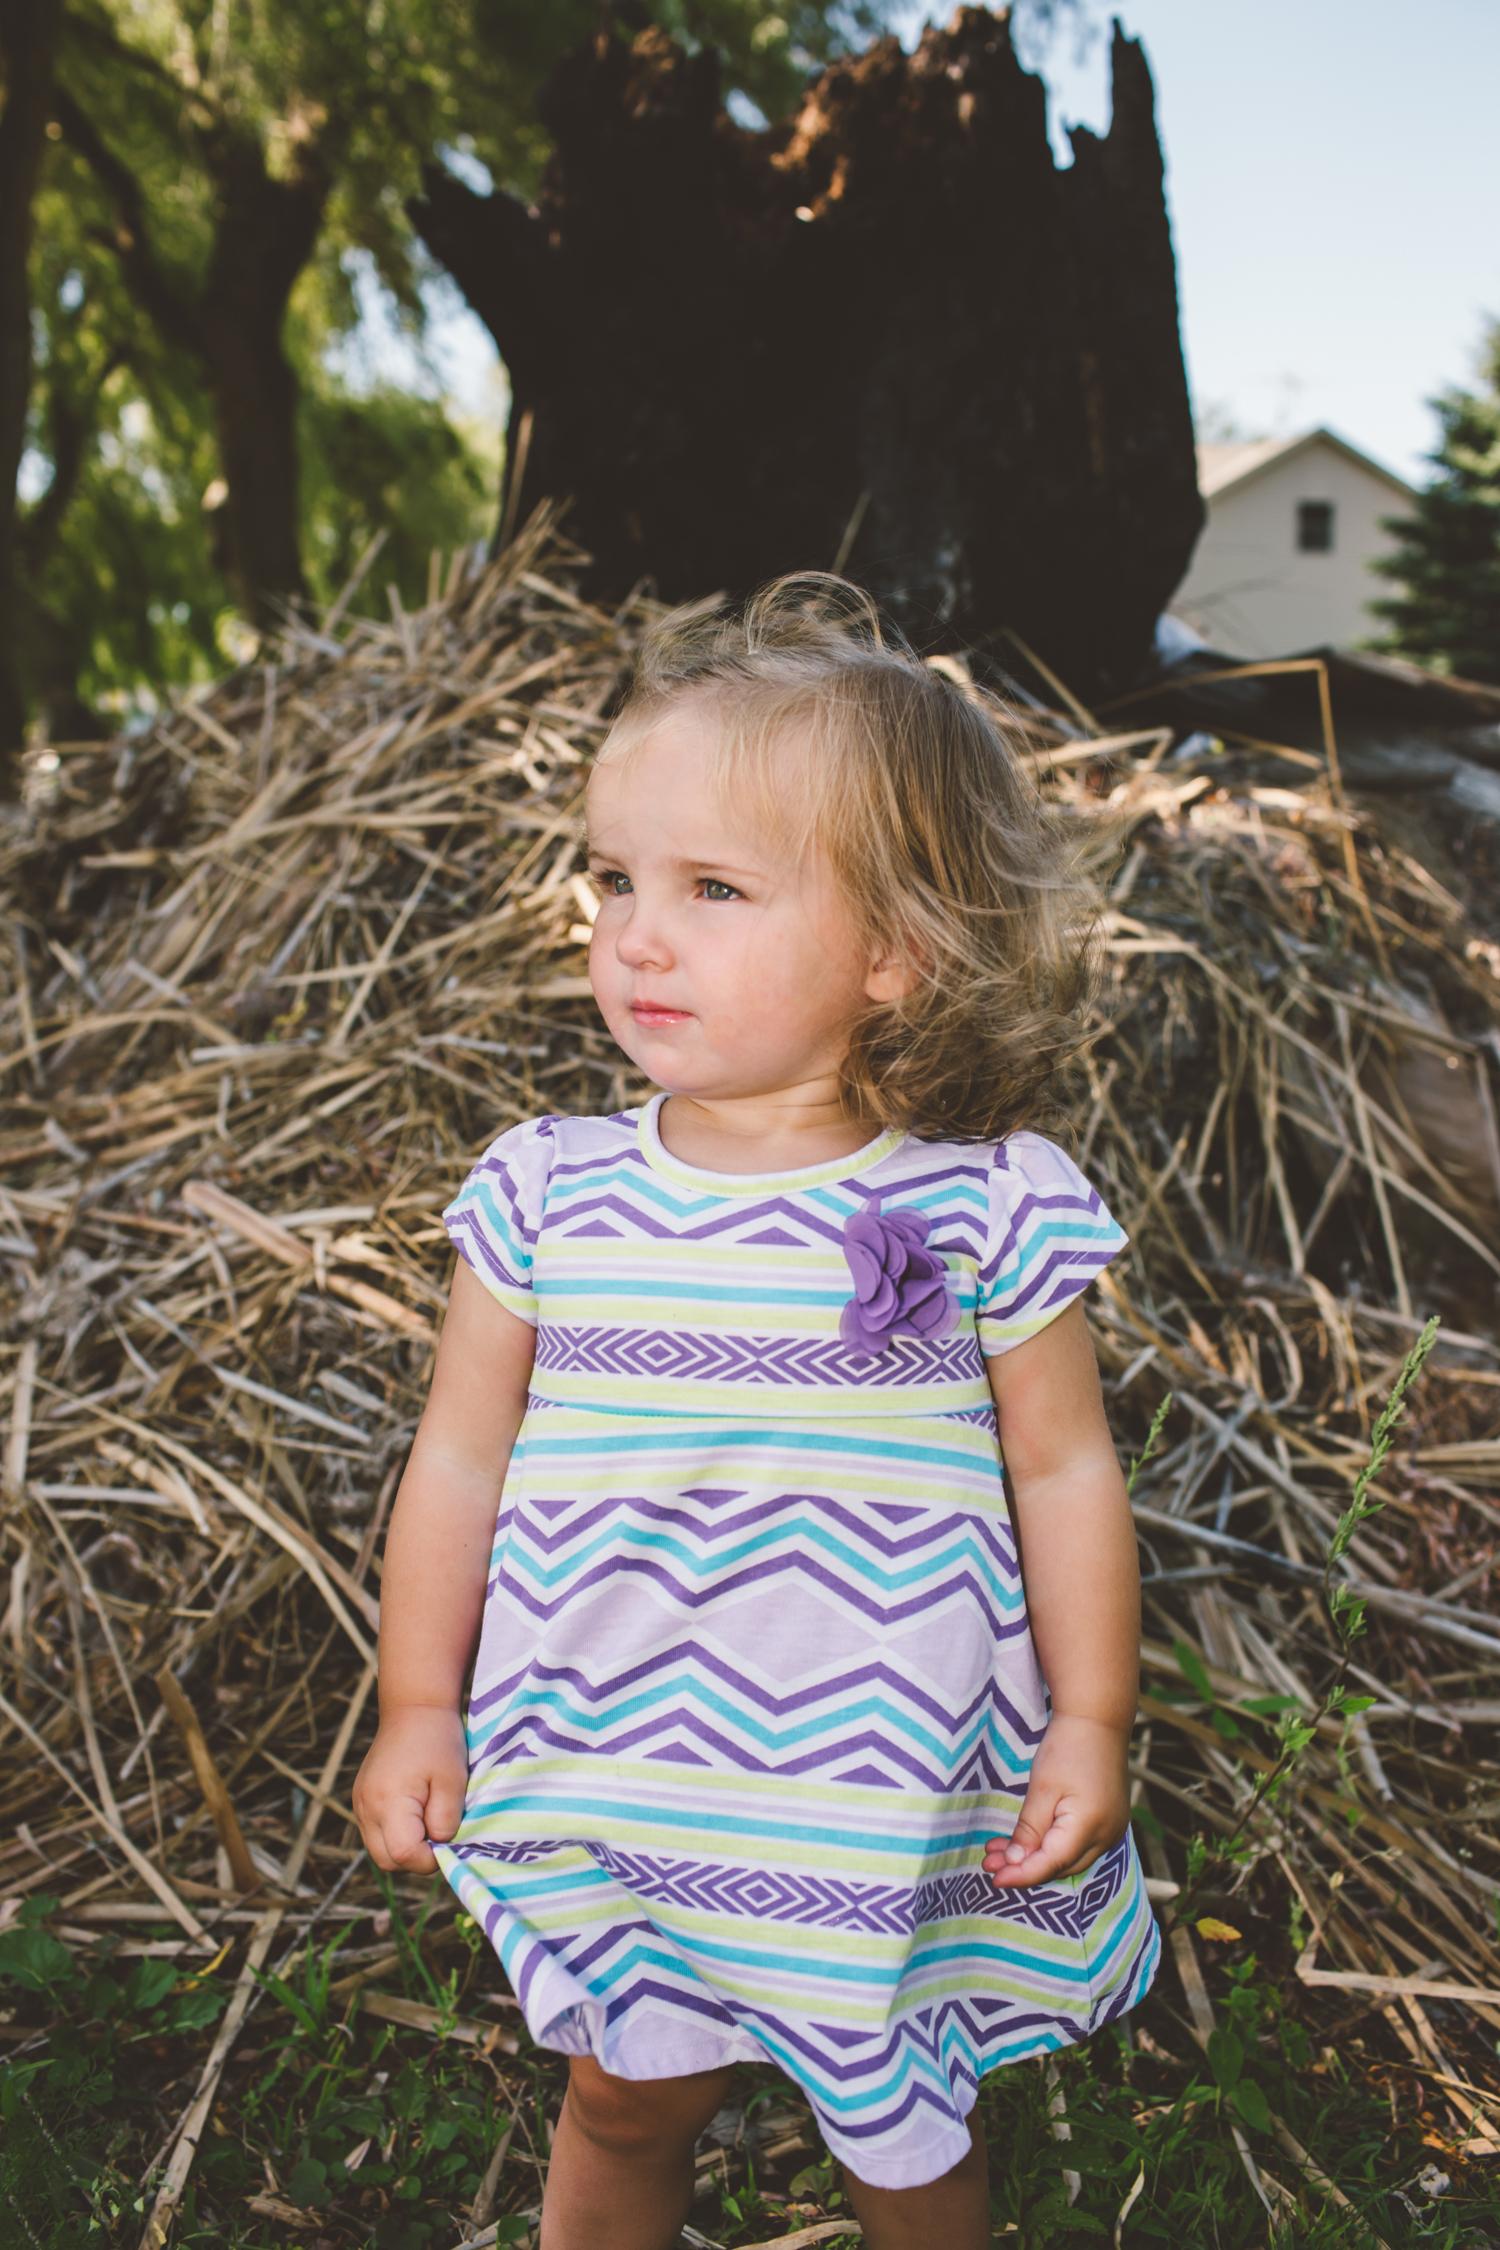 Jillian VanZytveld Photography - West Michigan Lifestyle Portraits - 23.jpg